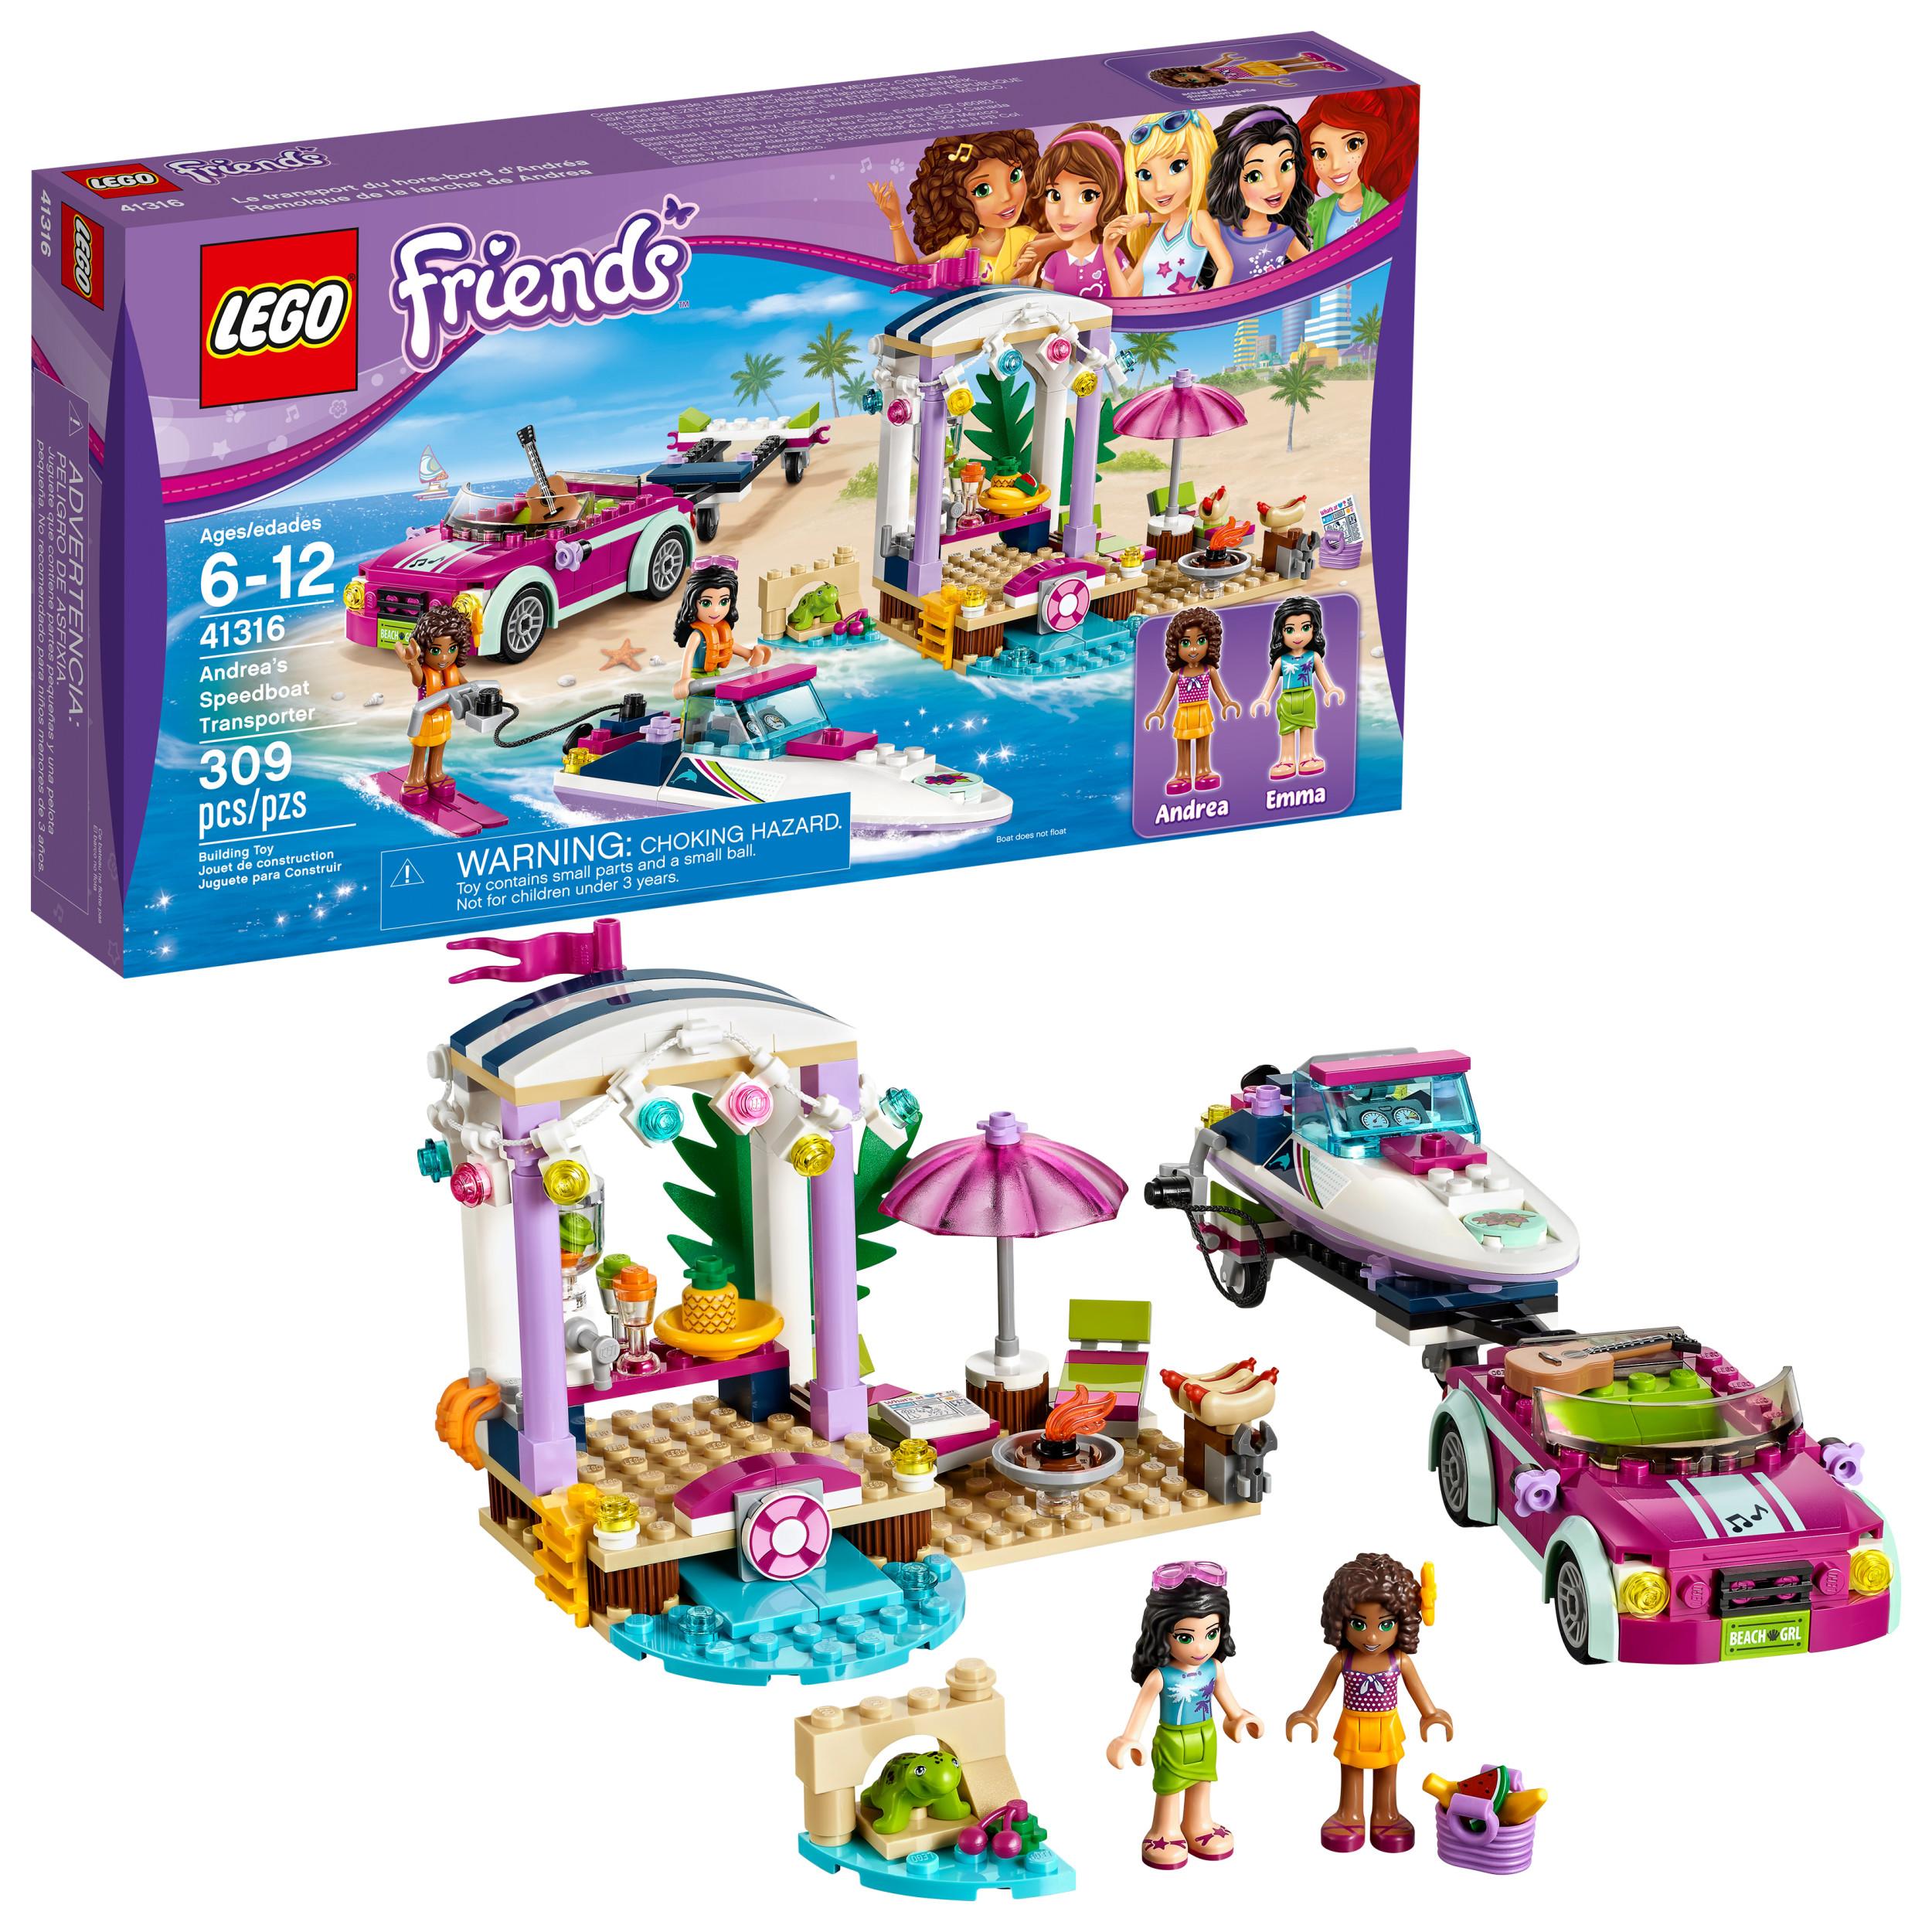 LEGO Friends Andrea's Speedboat Transporter 41316 (309 Pieces)